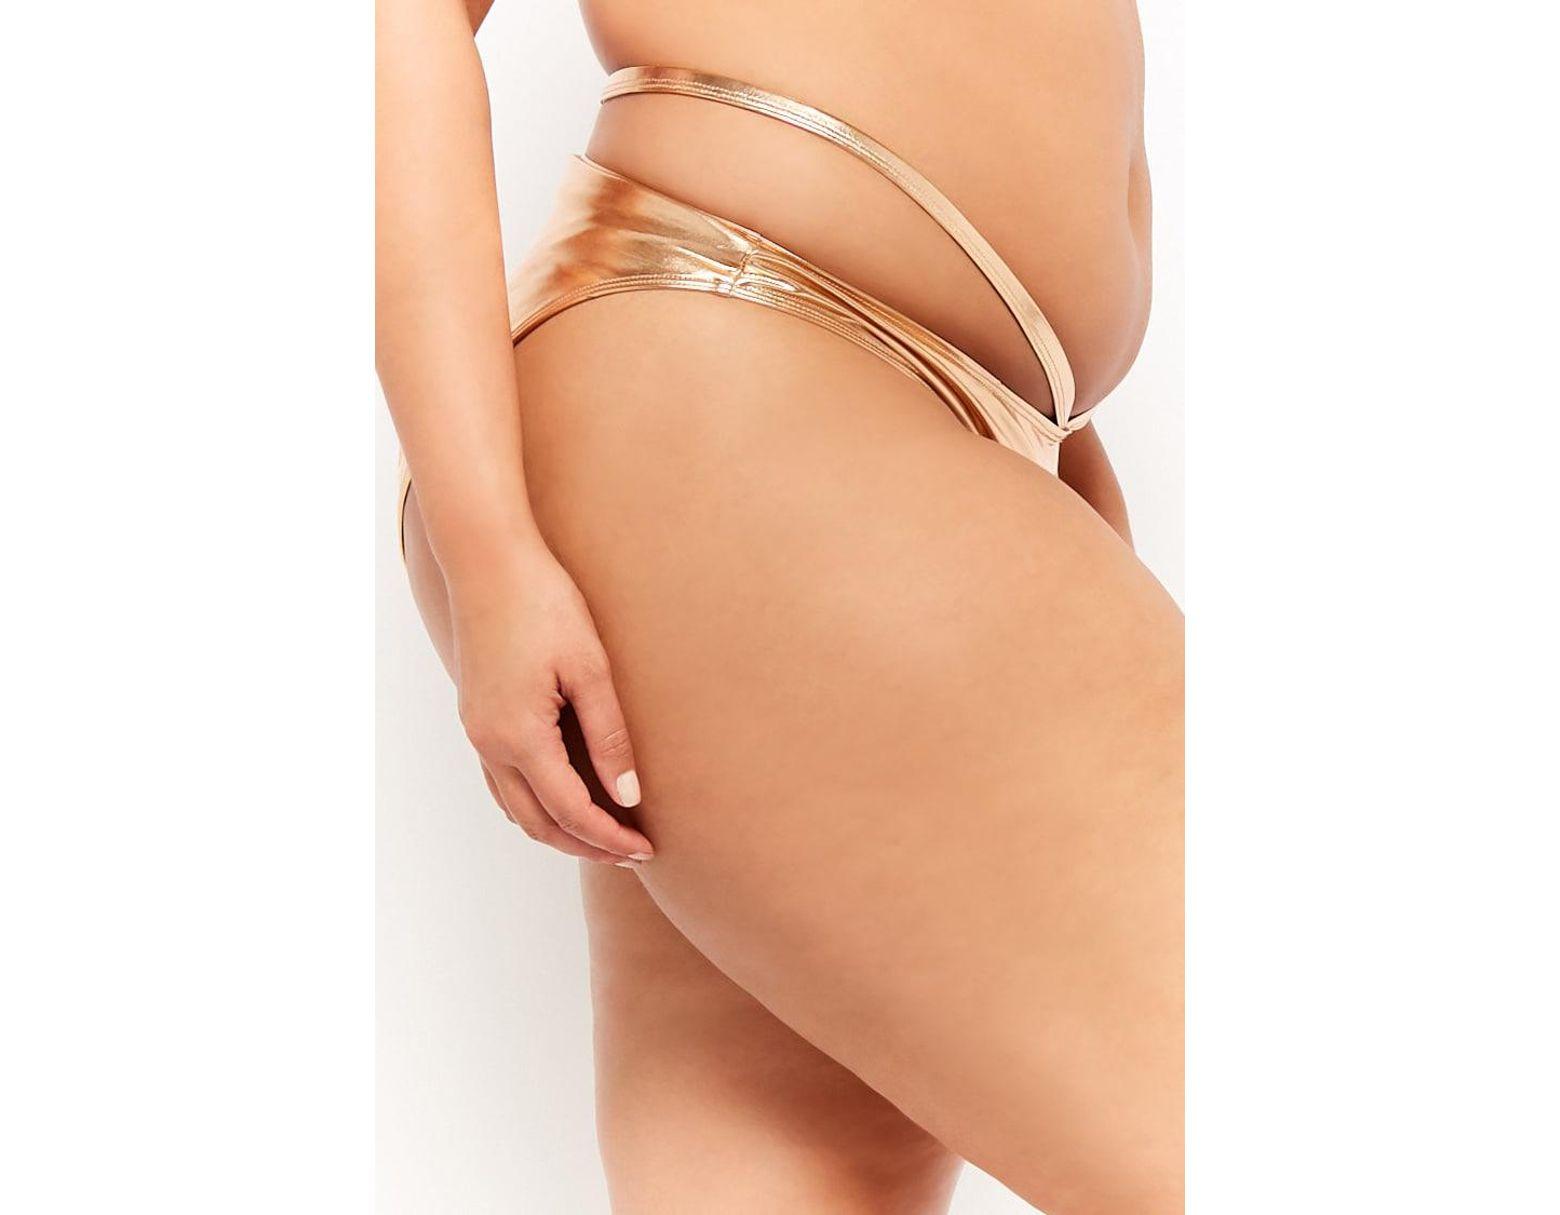 6cb51a75ba057 Forever 21 Women's Plus Size Metallic Strappy String Bikini Bottoms in  Metallic - Lyst